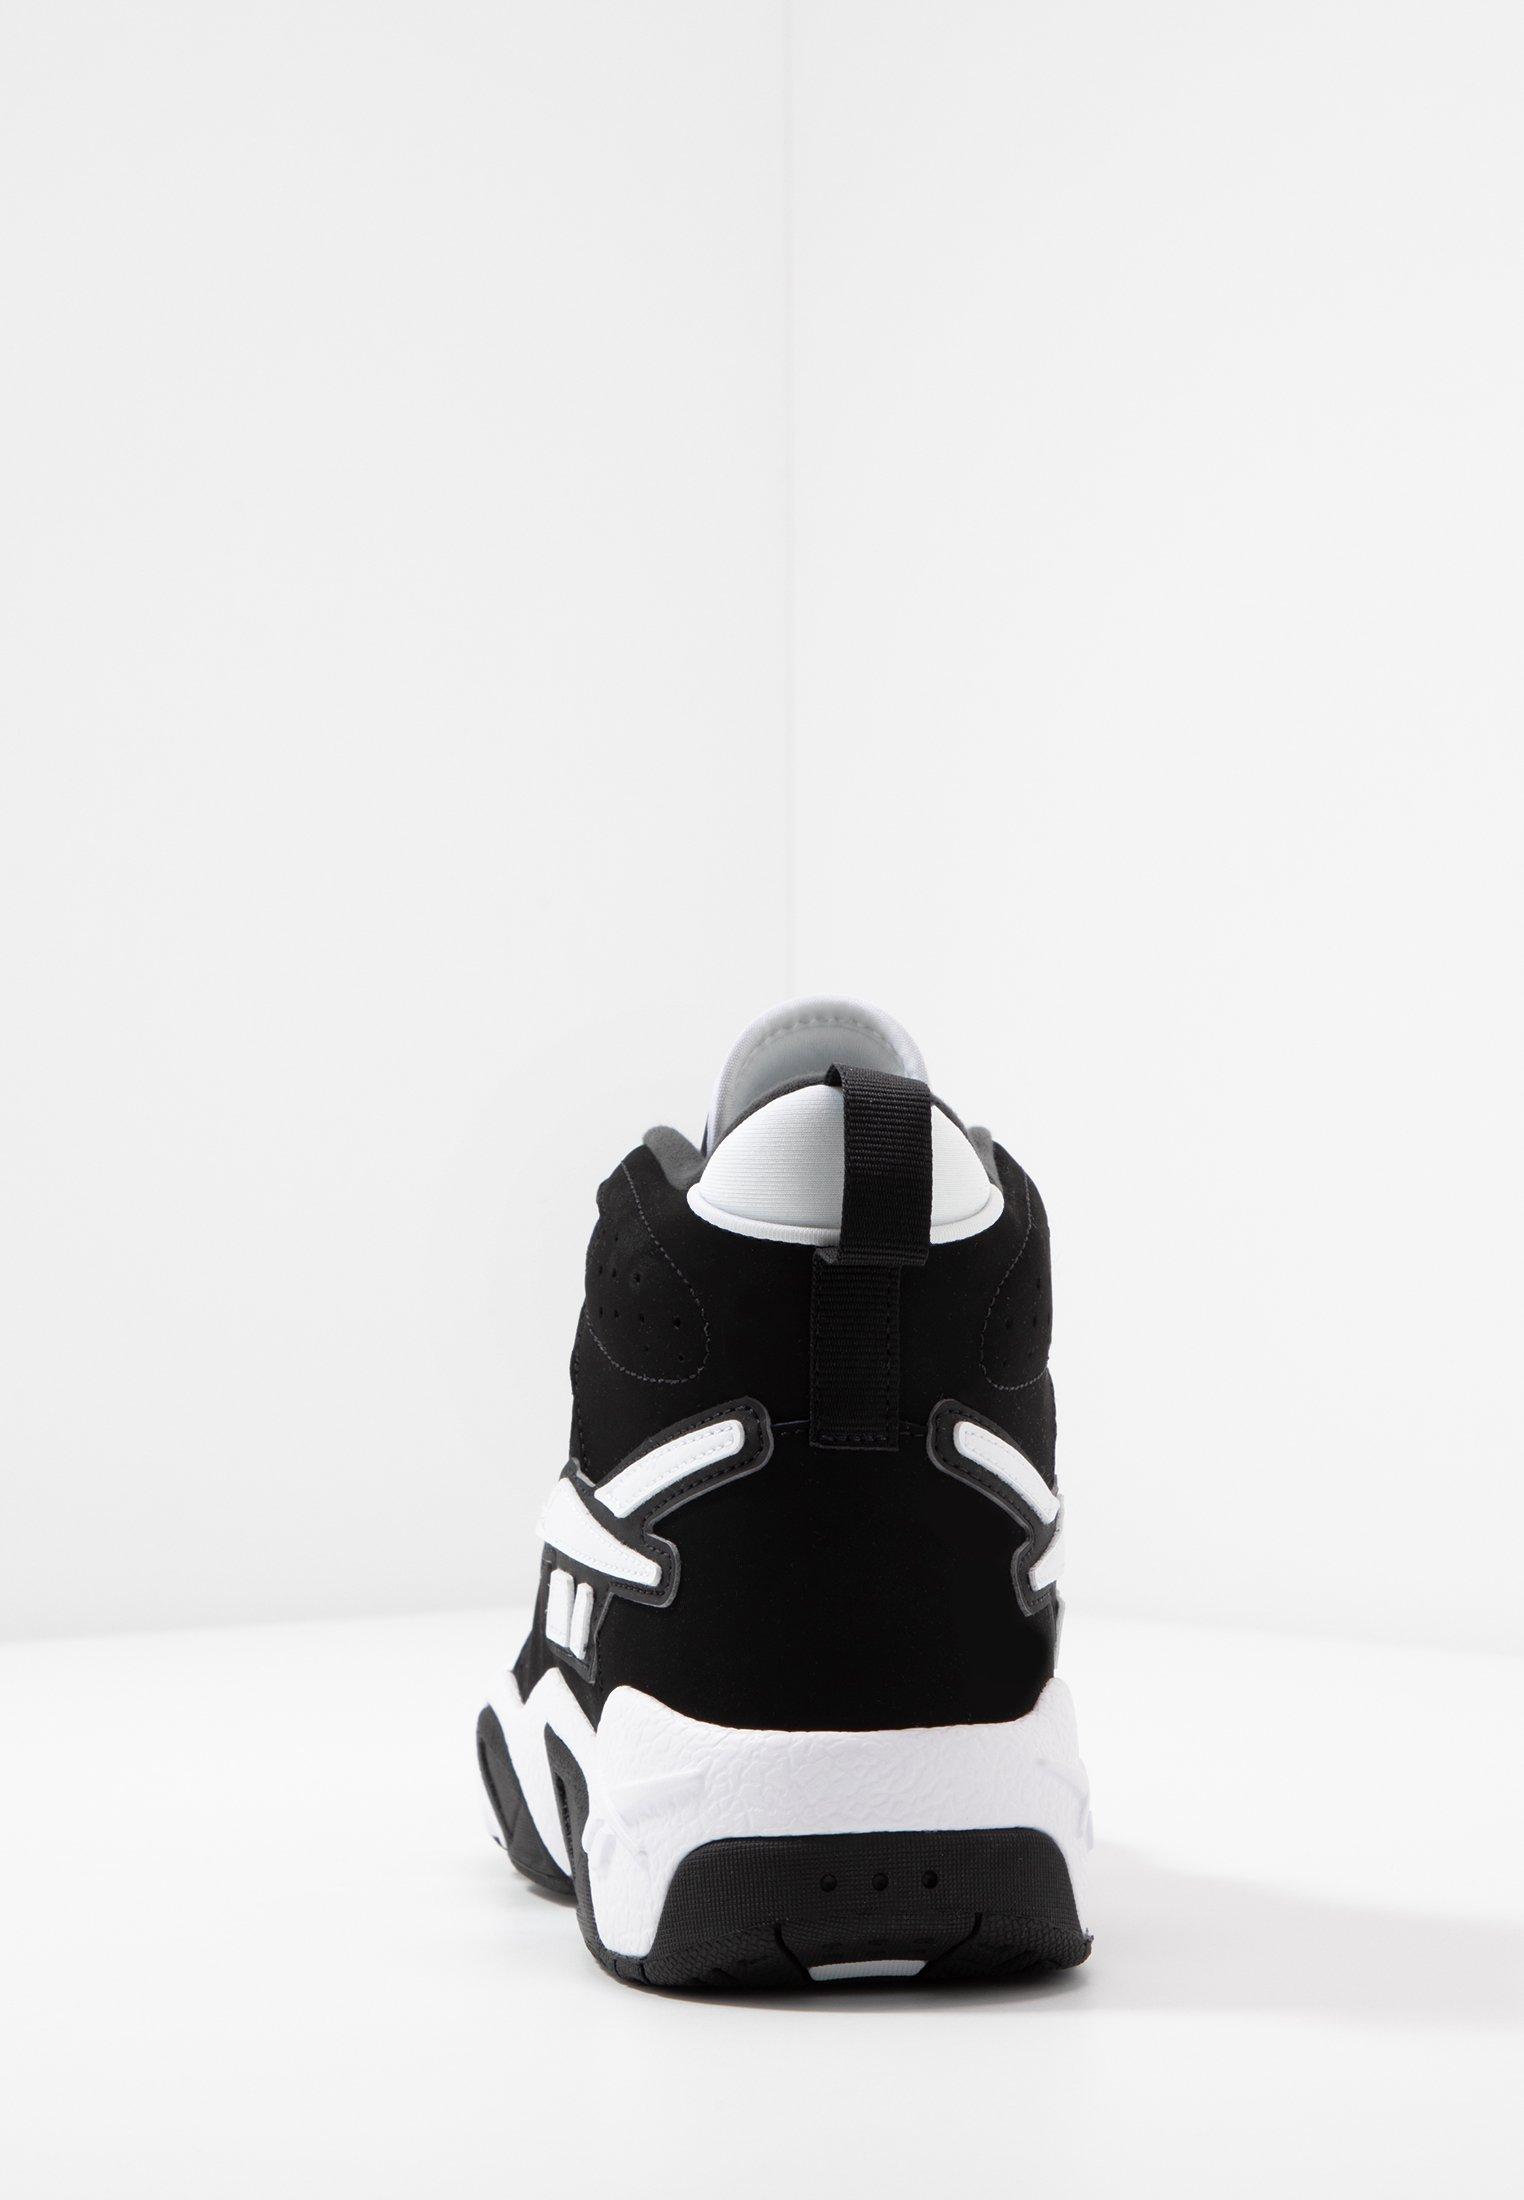 Reebok Classic Avant Guard Transition Bridge Shoes - Höga Sneakers Black/white/chalk